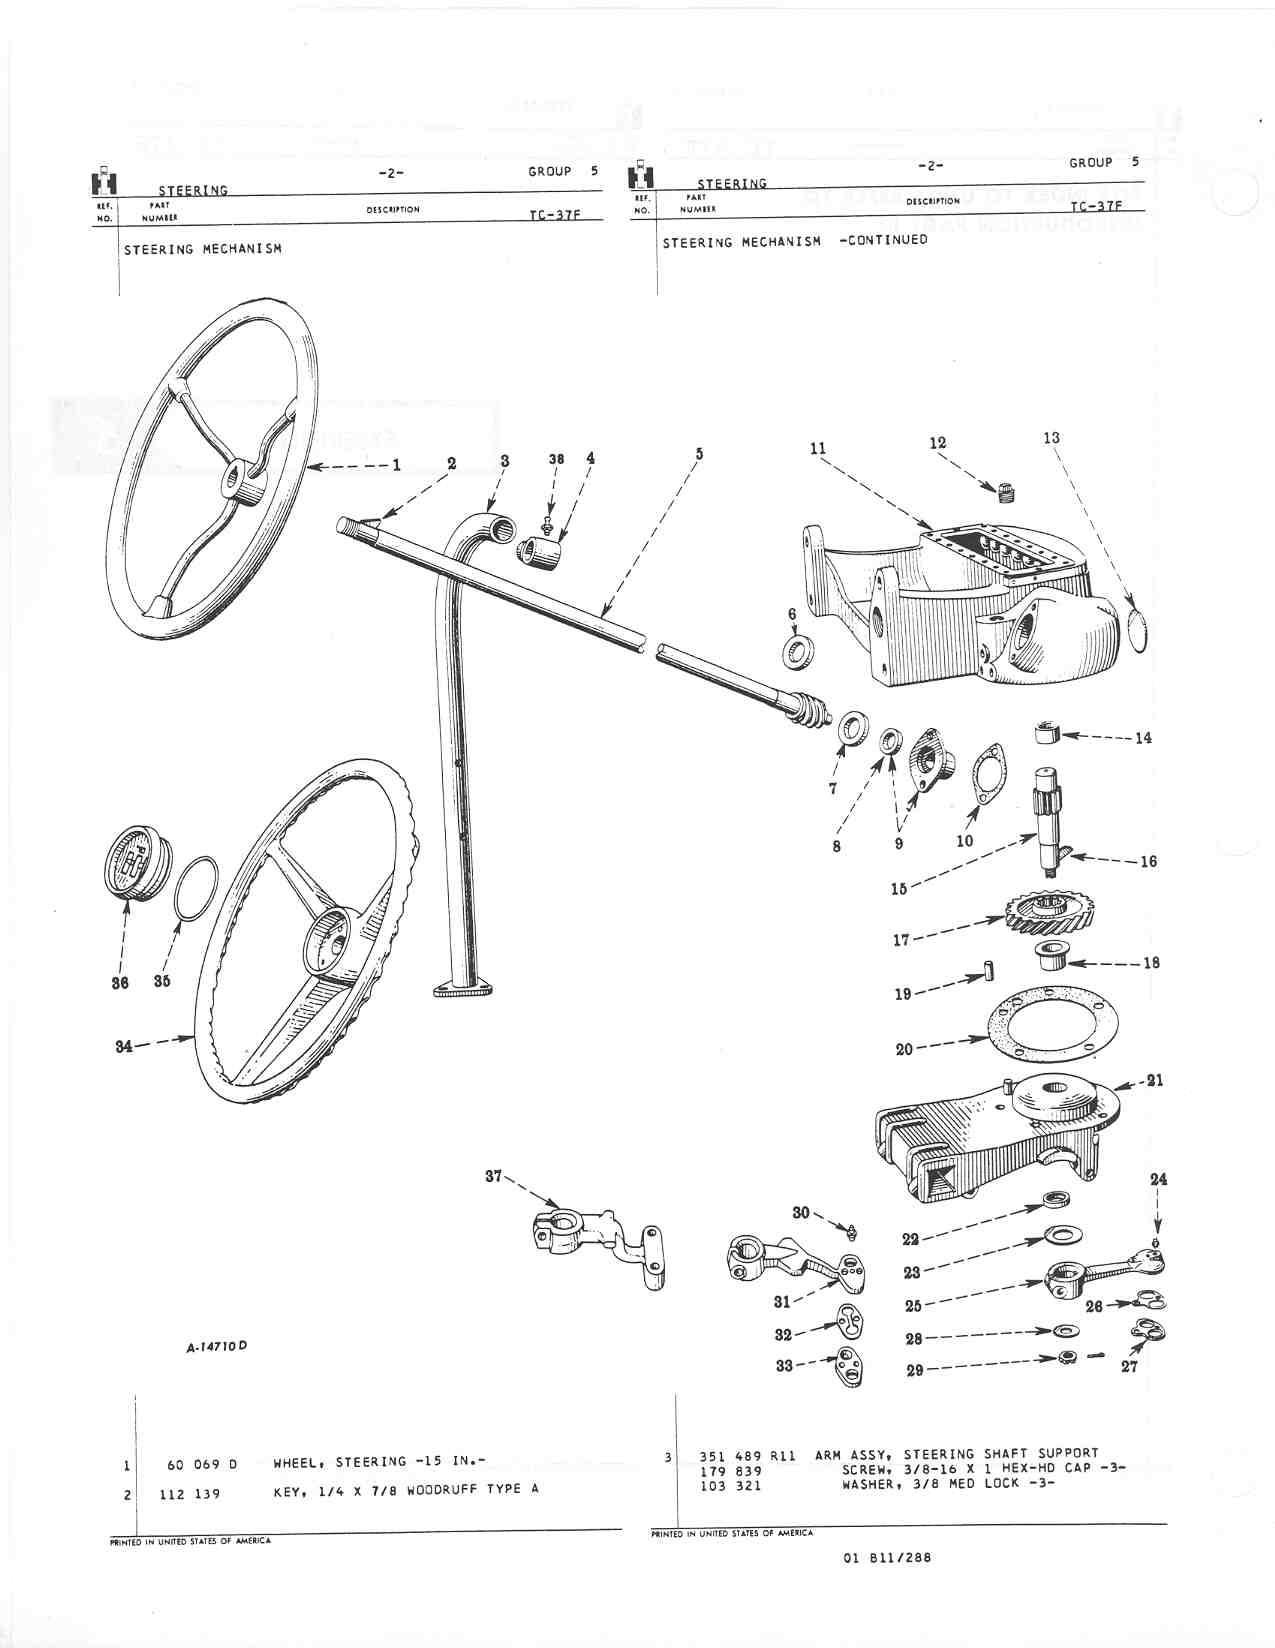 farmall cub parts diagram motor wiring diagram all data Farmall Cub PTO Adapter farmall cub parts diagram motor wiring diagram online farmall cub pto diagram farmall cub diagram motor